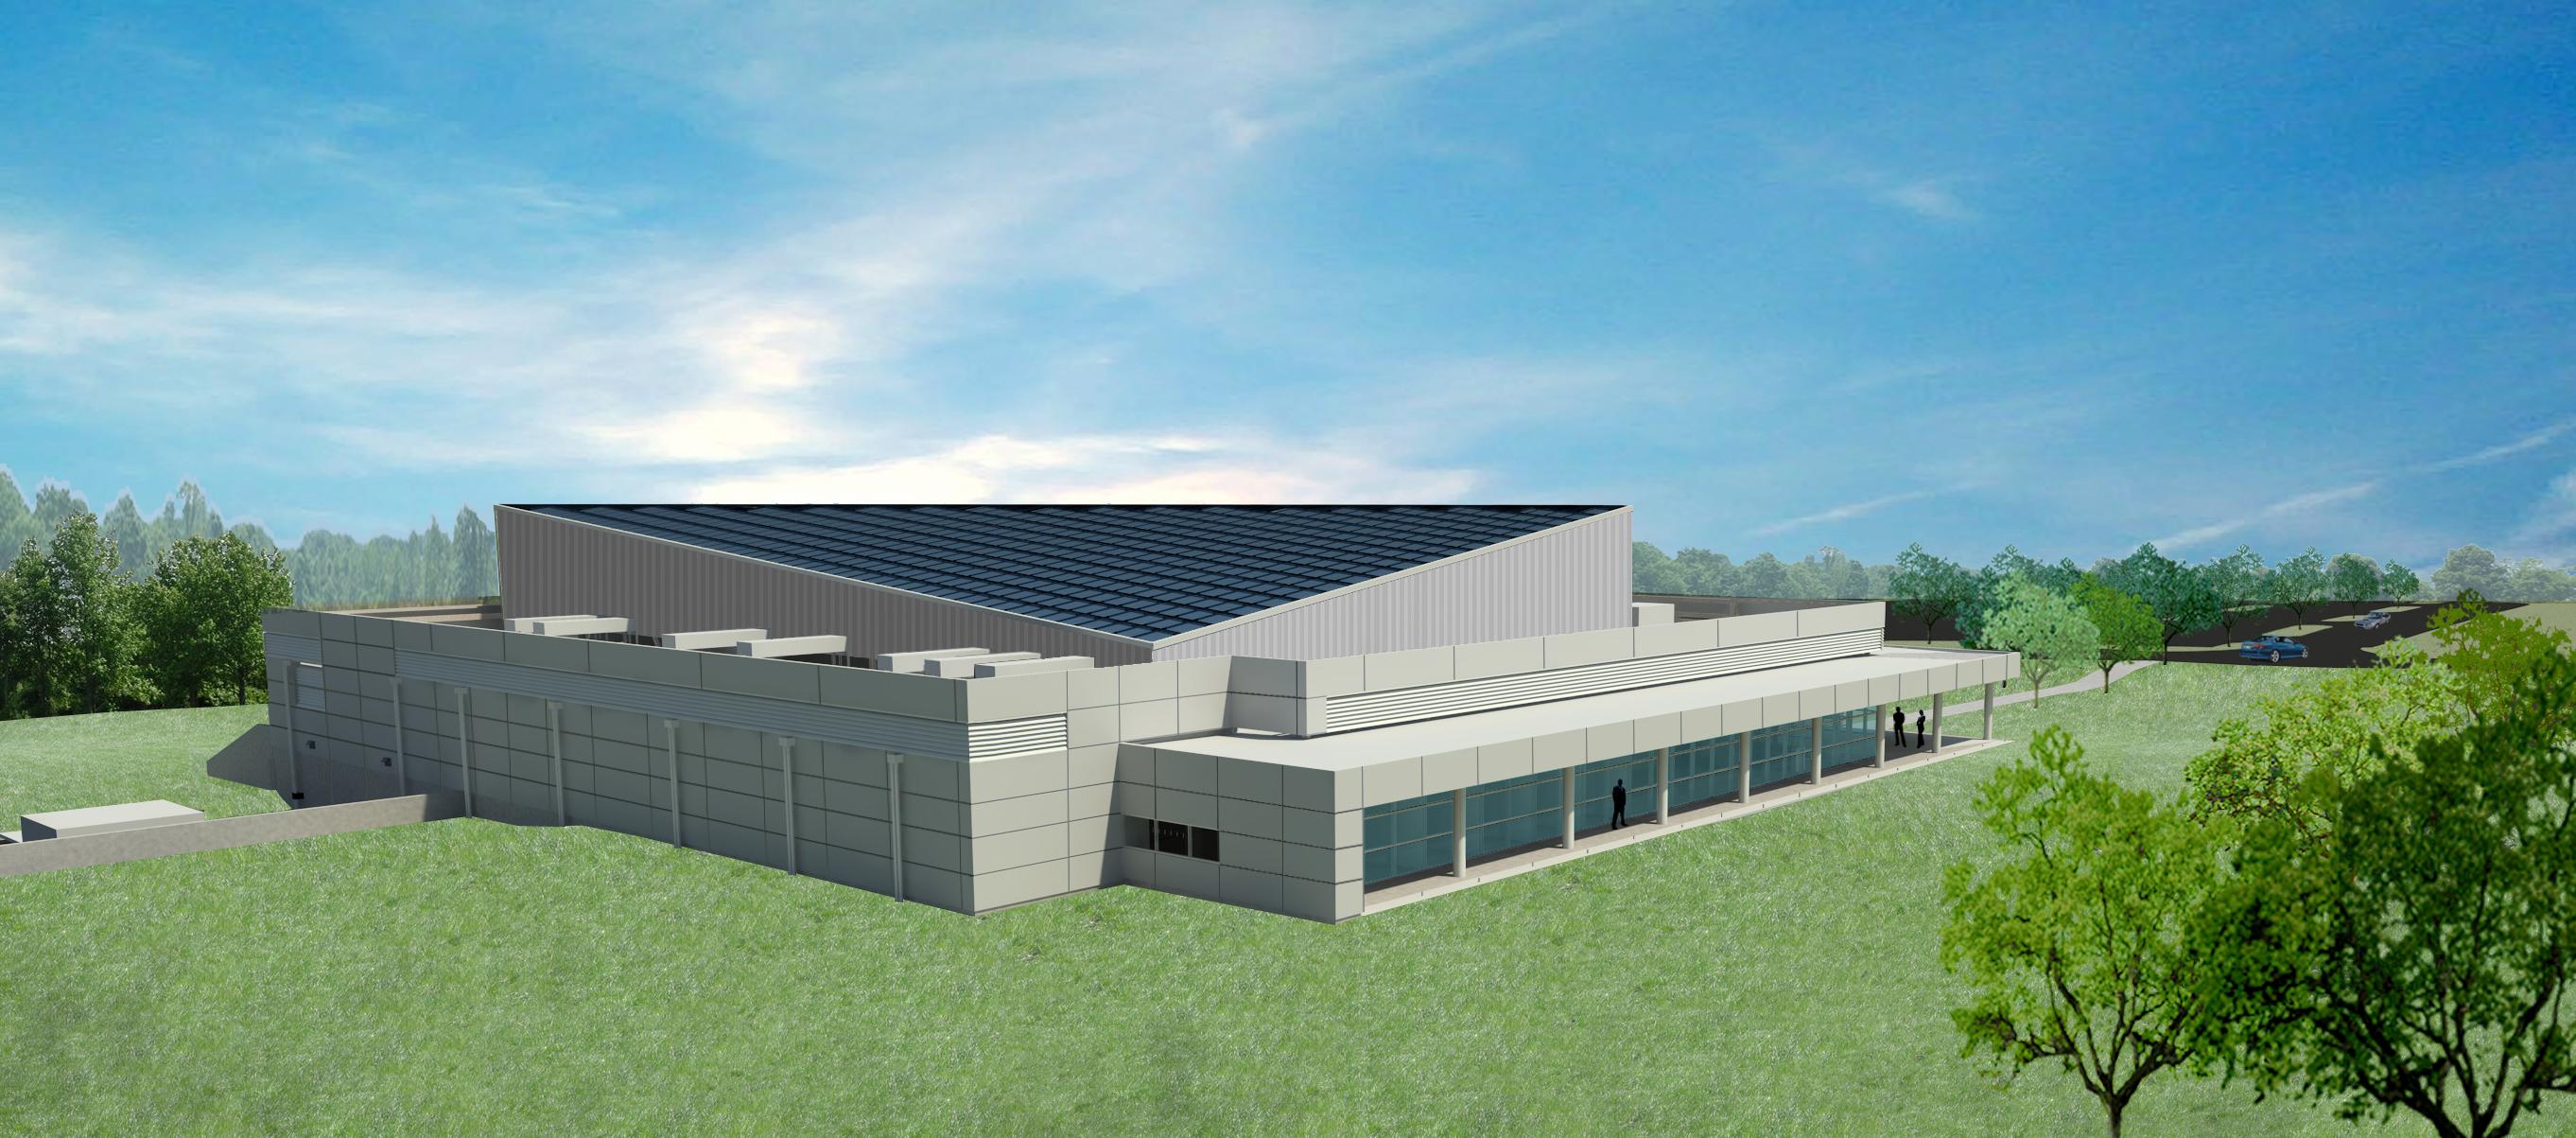 Emerson Building New Energy Efficient Data Center